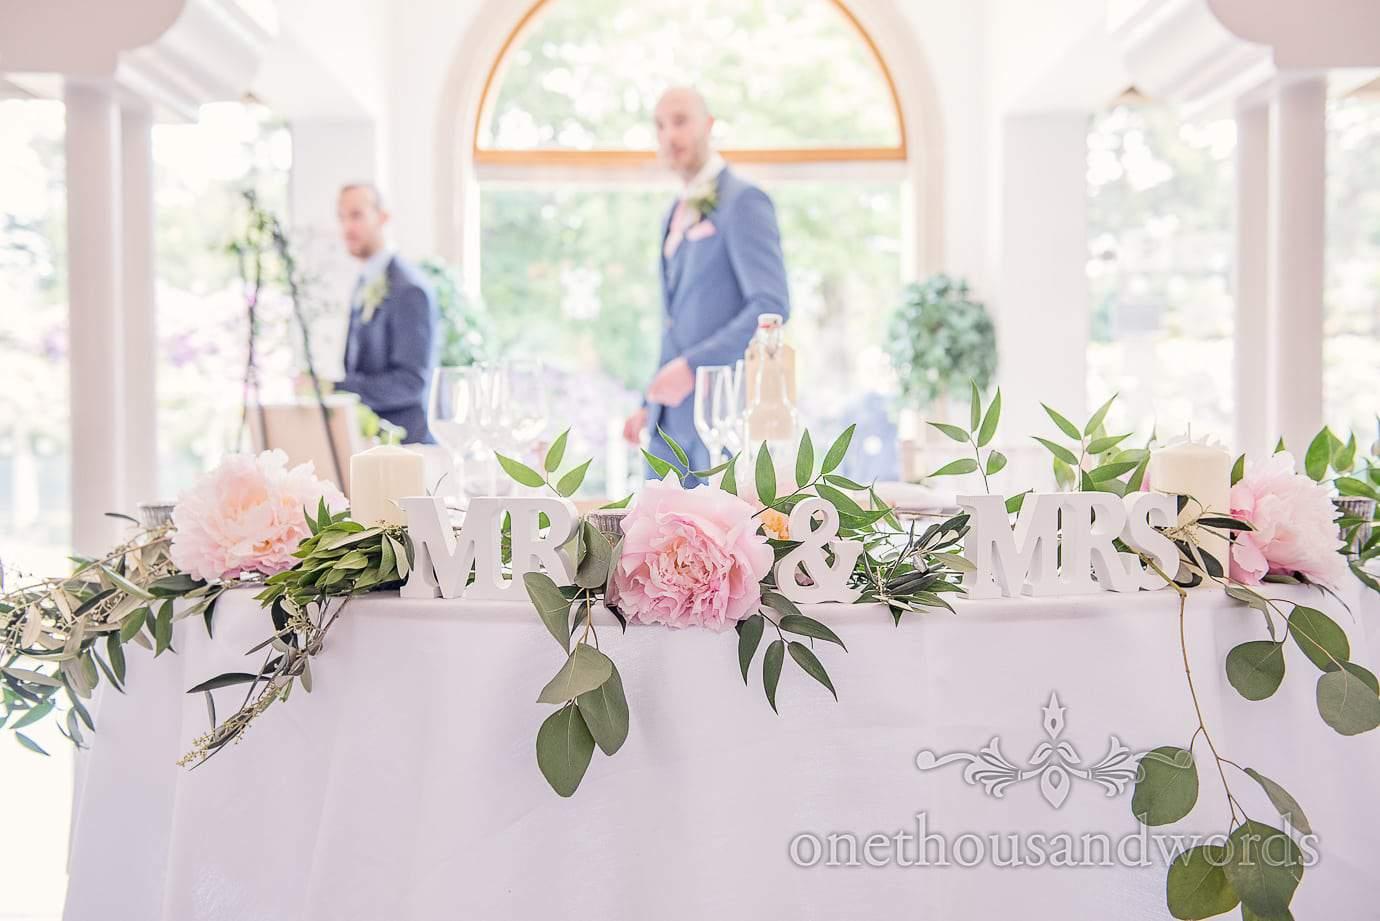 Top table decoration at Italian Villa wedding photographs